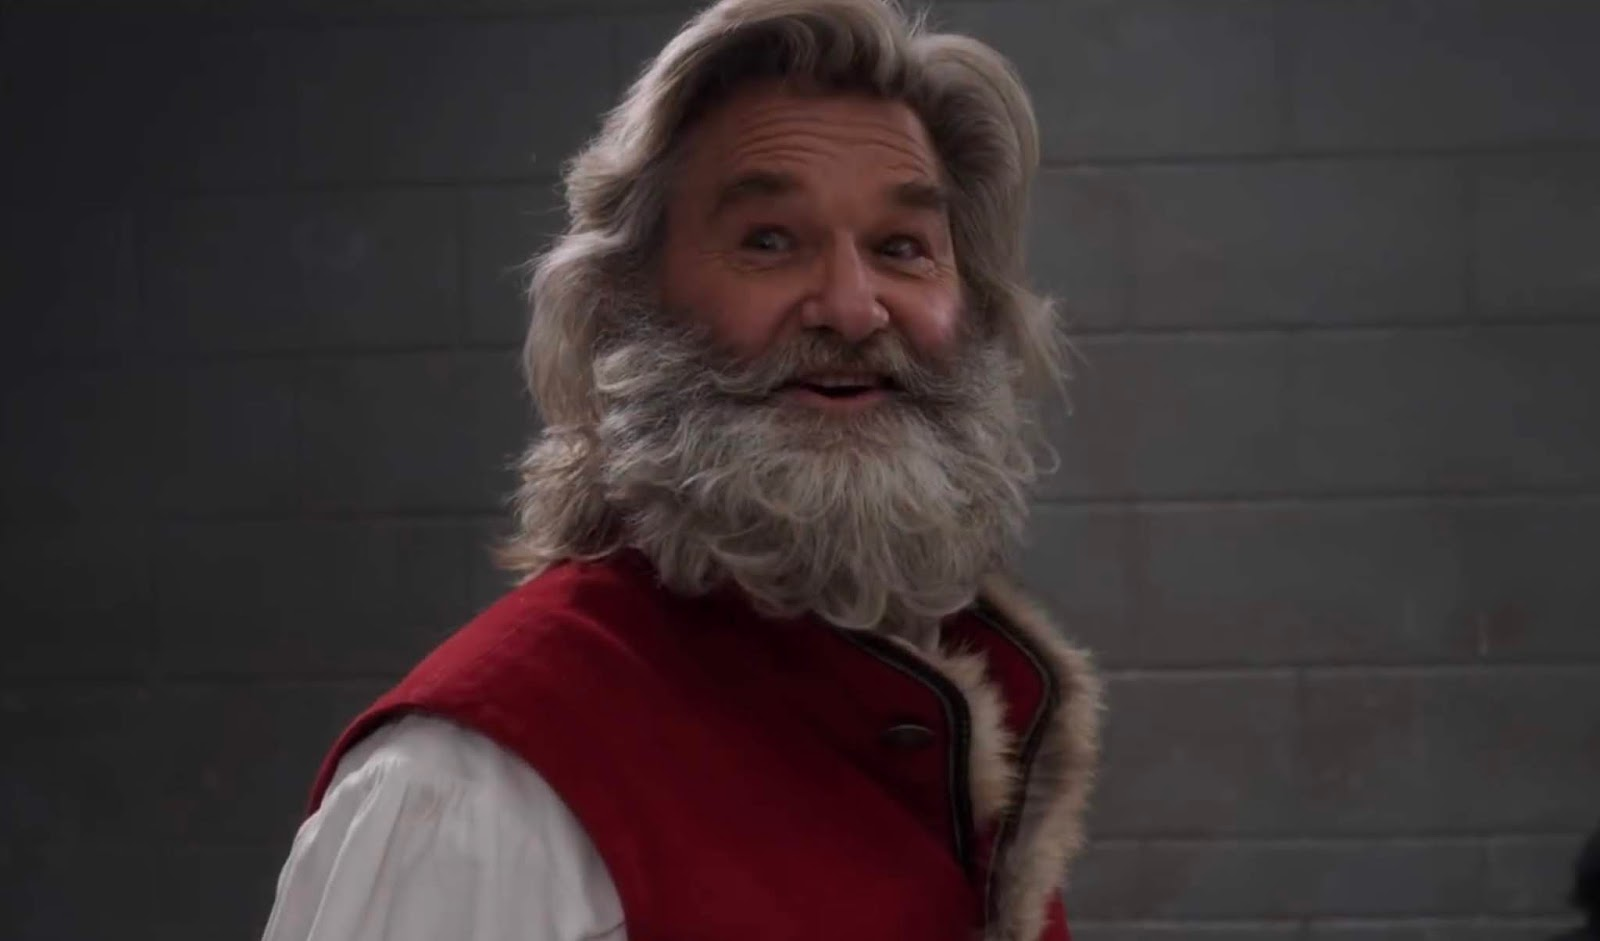 Christmas Chronicles Mrs Claus.Jon Crunch Review Netflix S The Christmas Chronicles